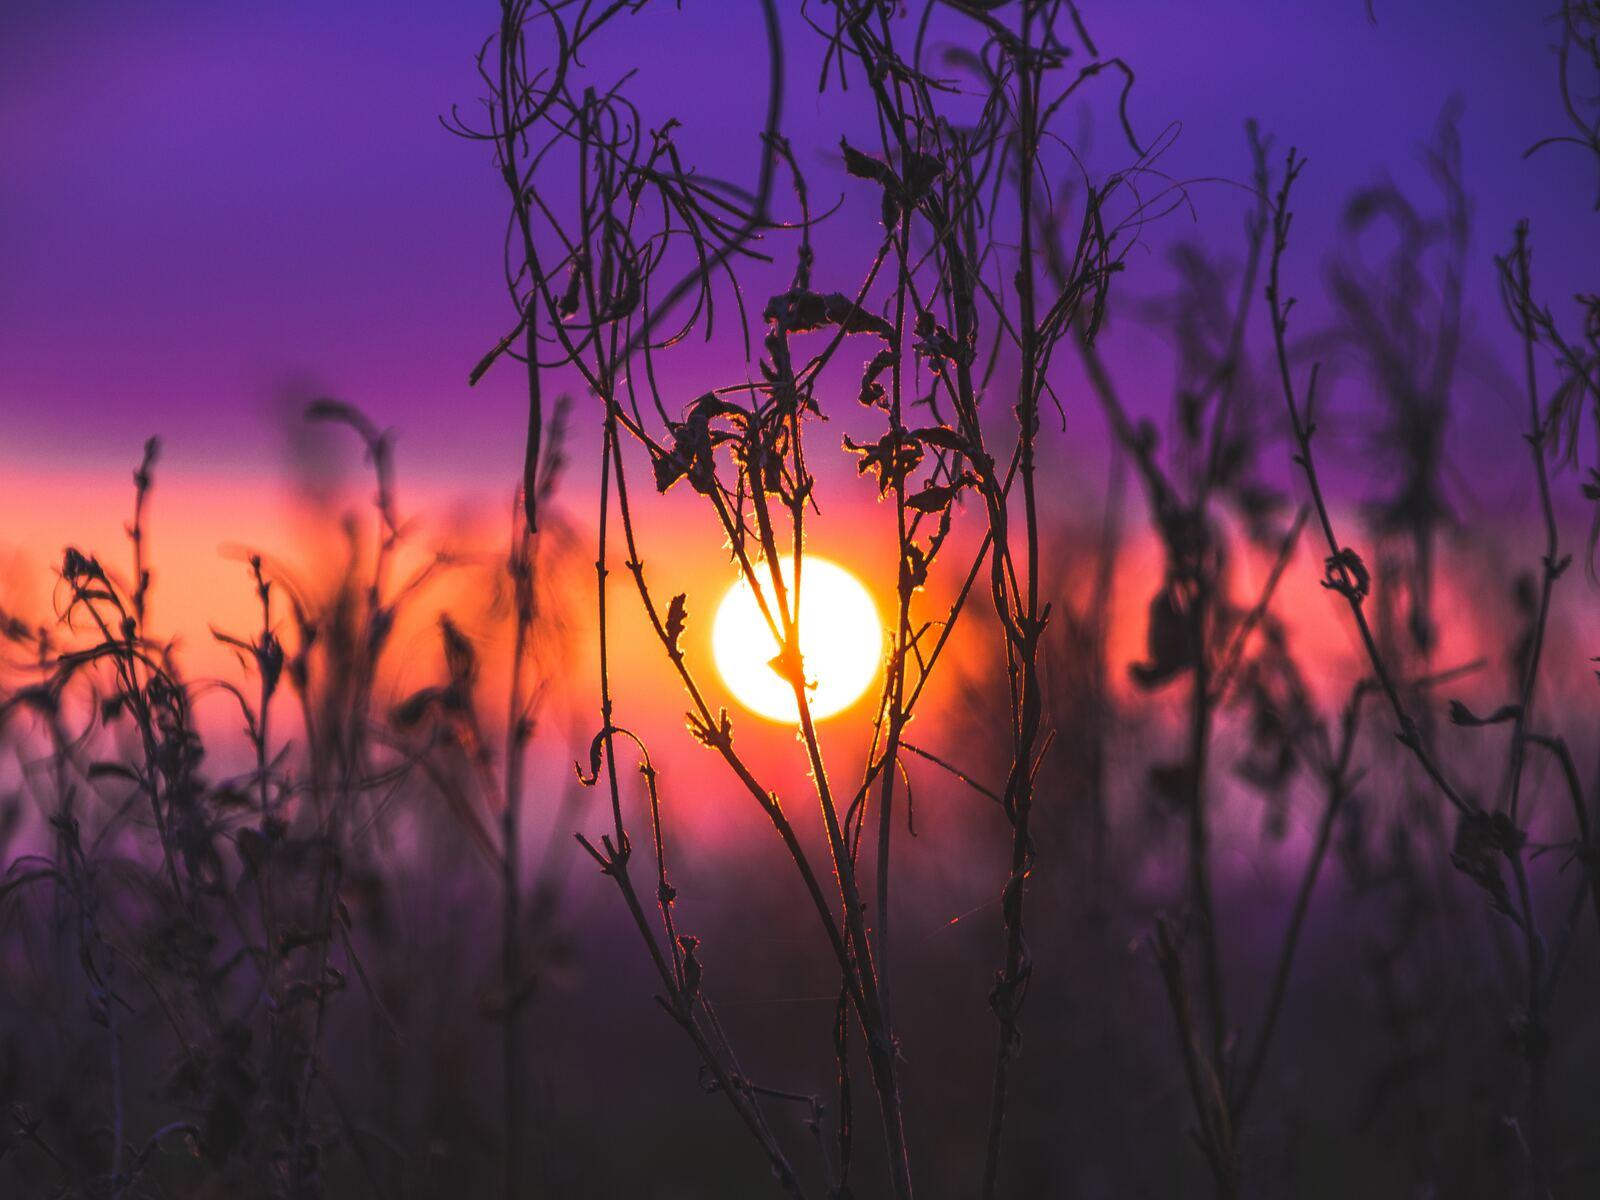 morning-glow-grass-field-so.jpg